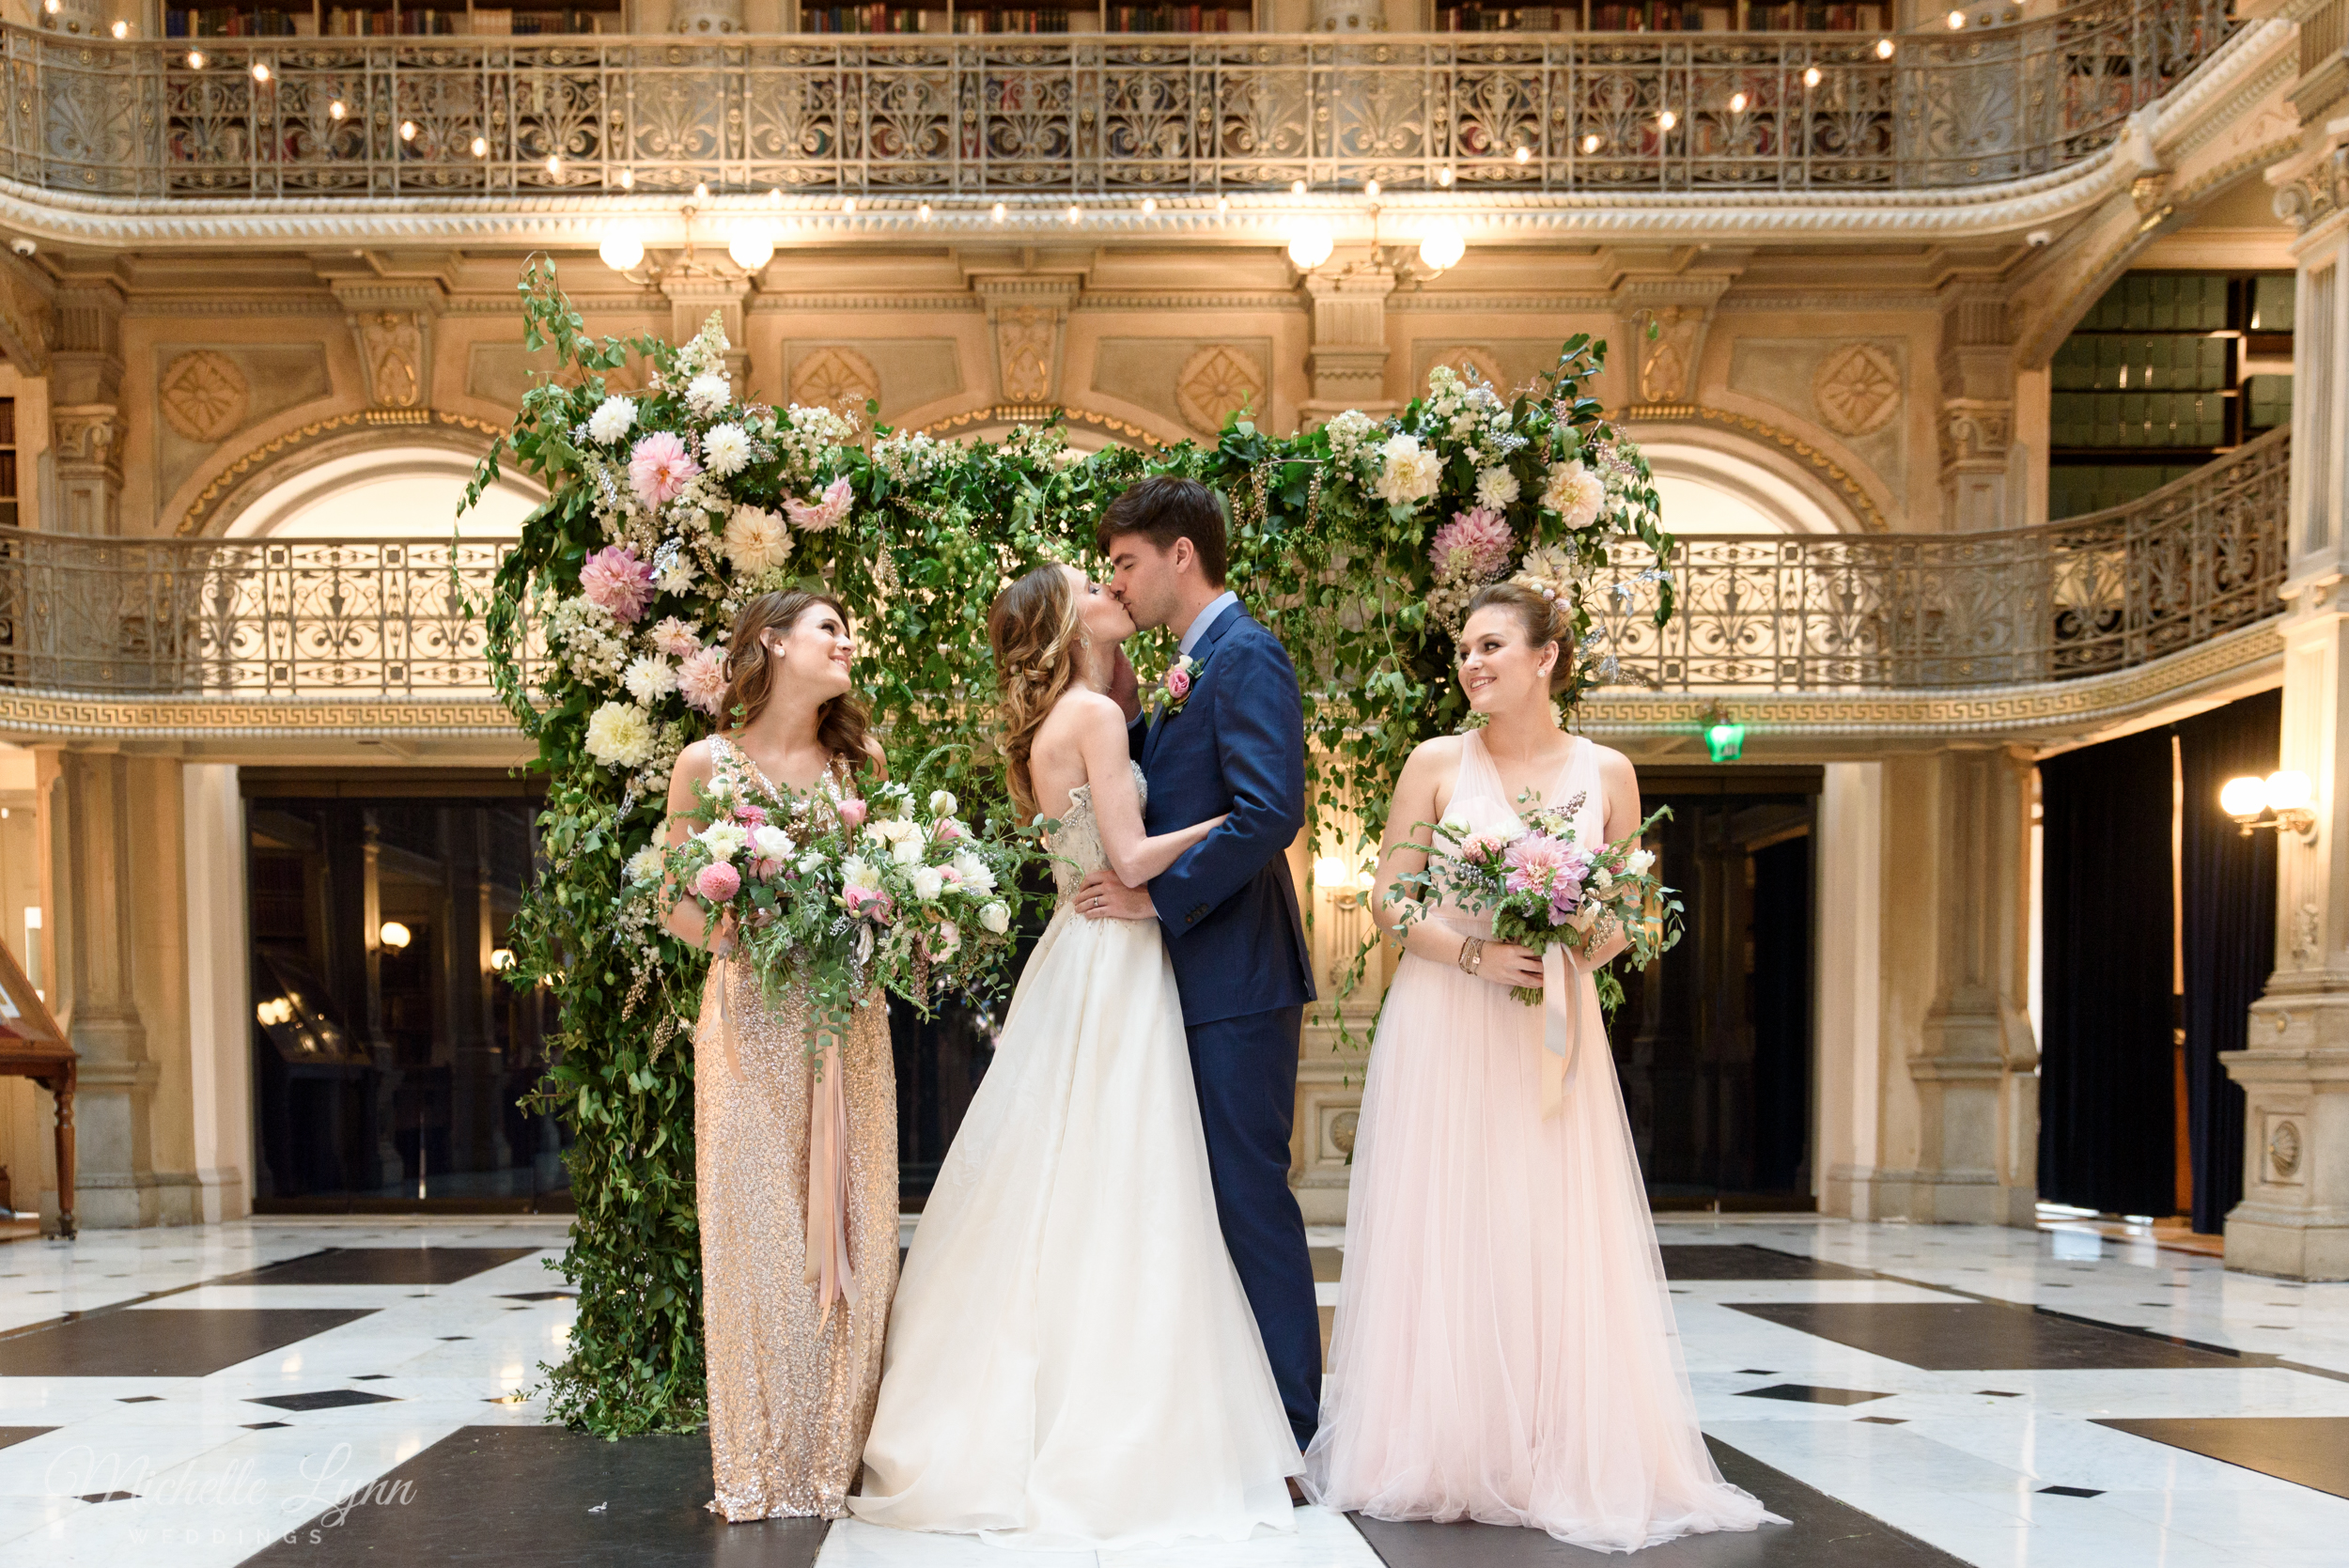 George_Peabody_Library-Wedding_Styled_Shoot-32.jpg